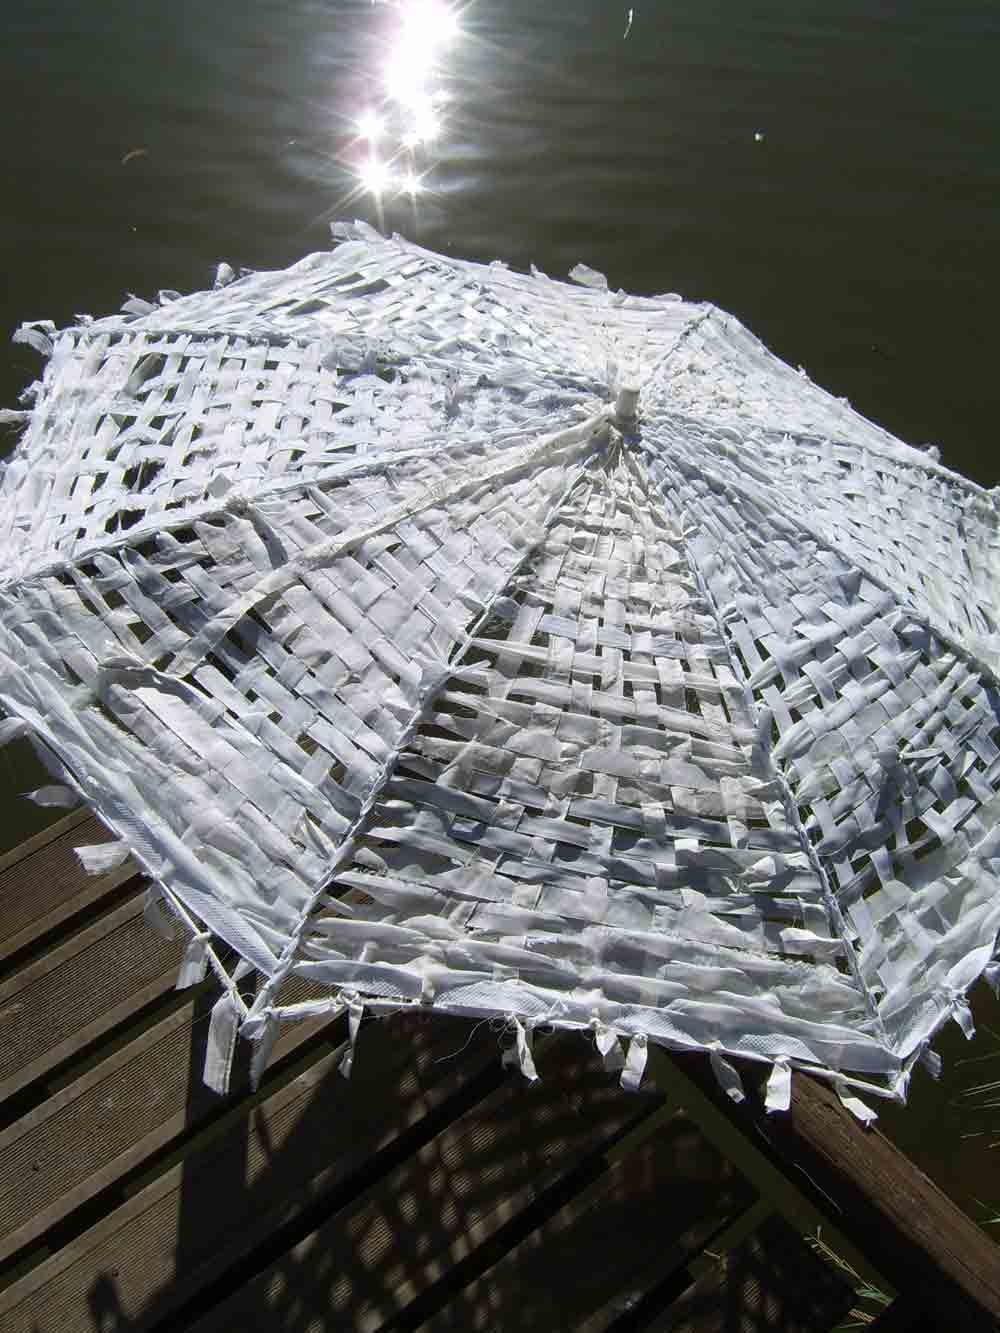 'JapaneseJoyTwo'..upcycling textile waste... & handwoven by Portuguese weaver & textile designer Helena Loermans. She runs workshops! via the designer's site